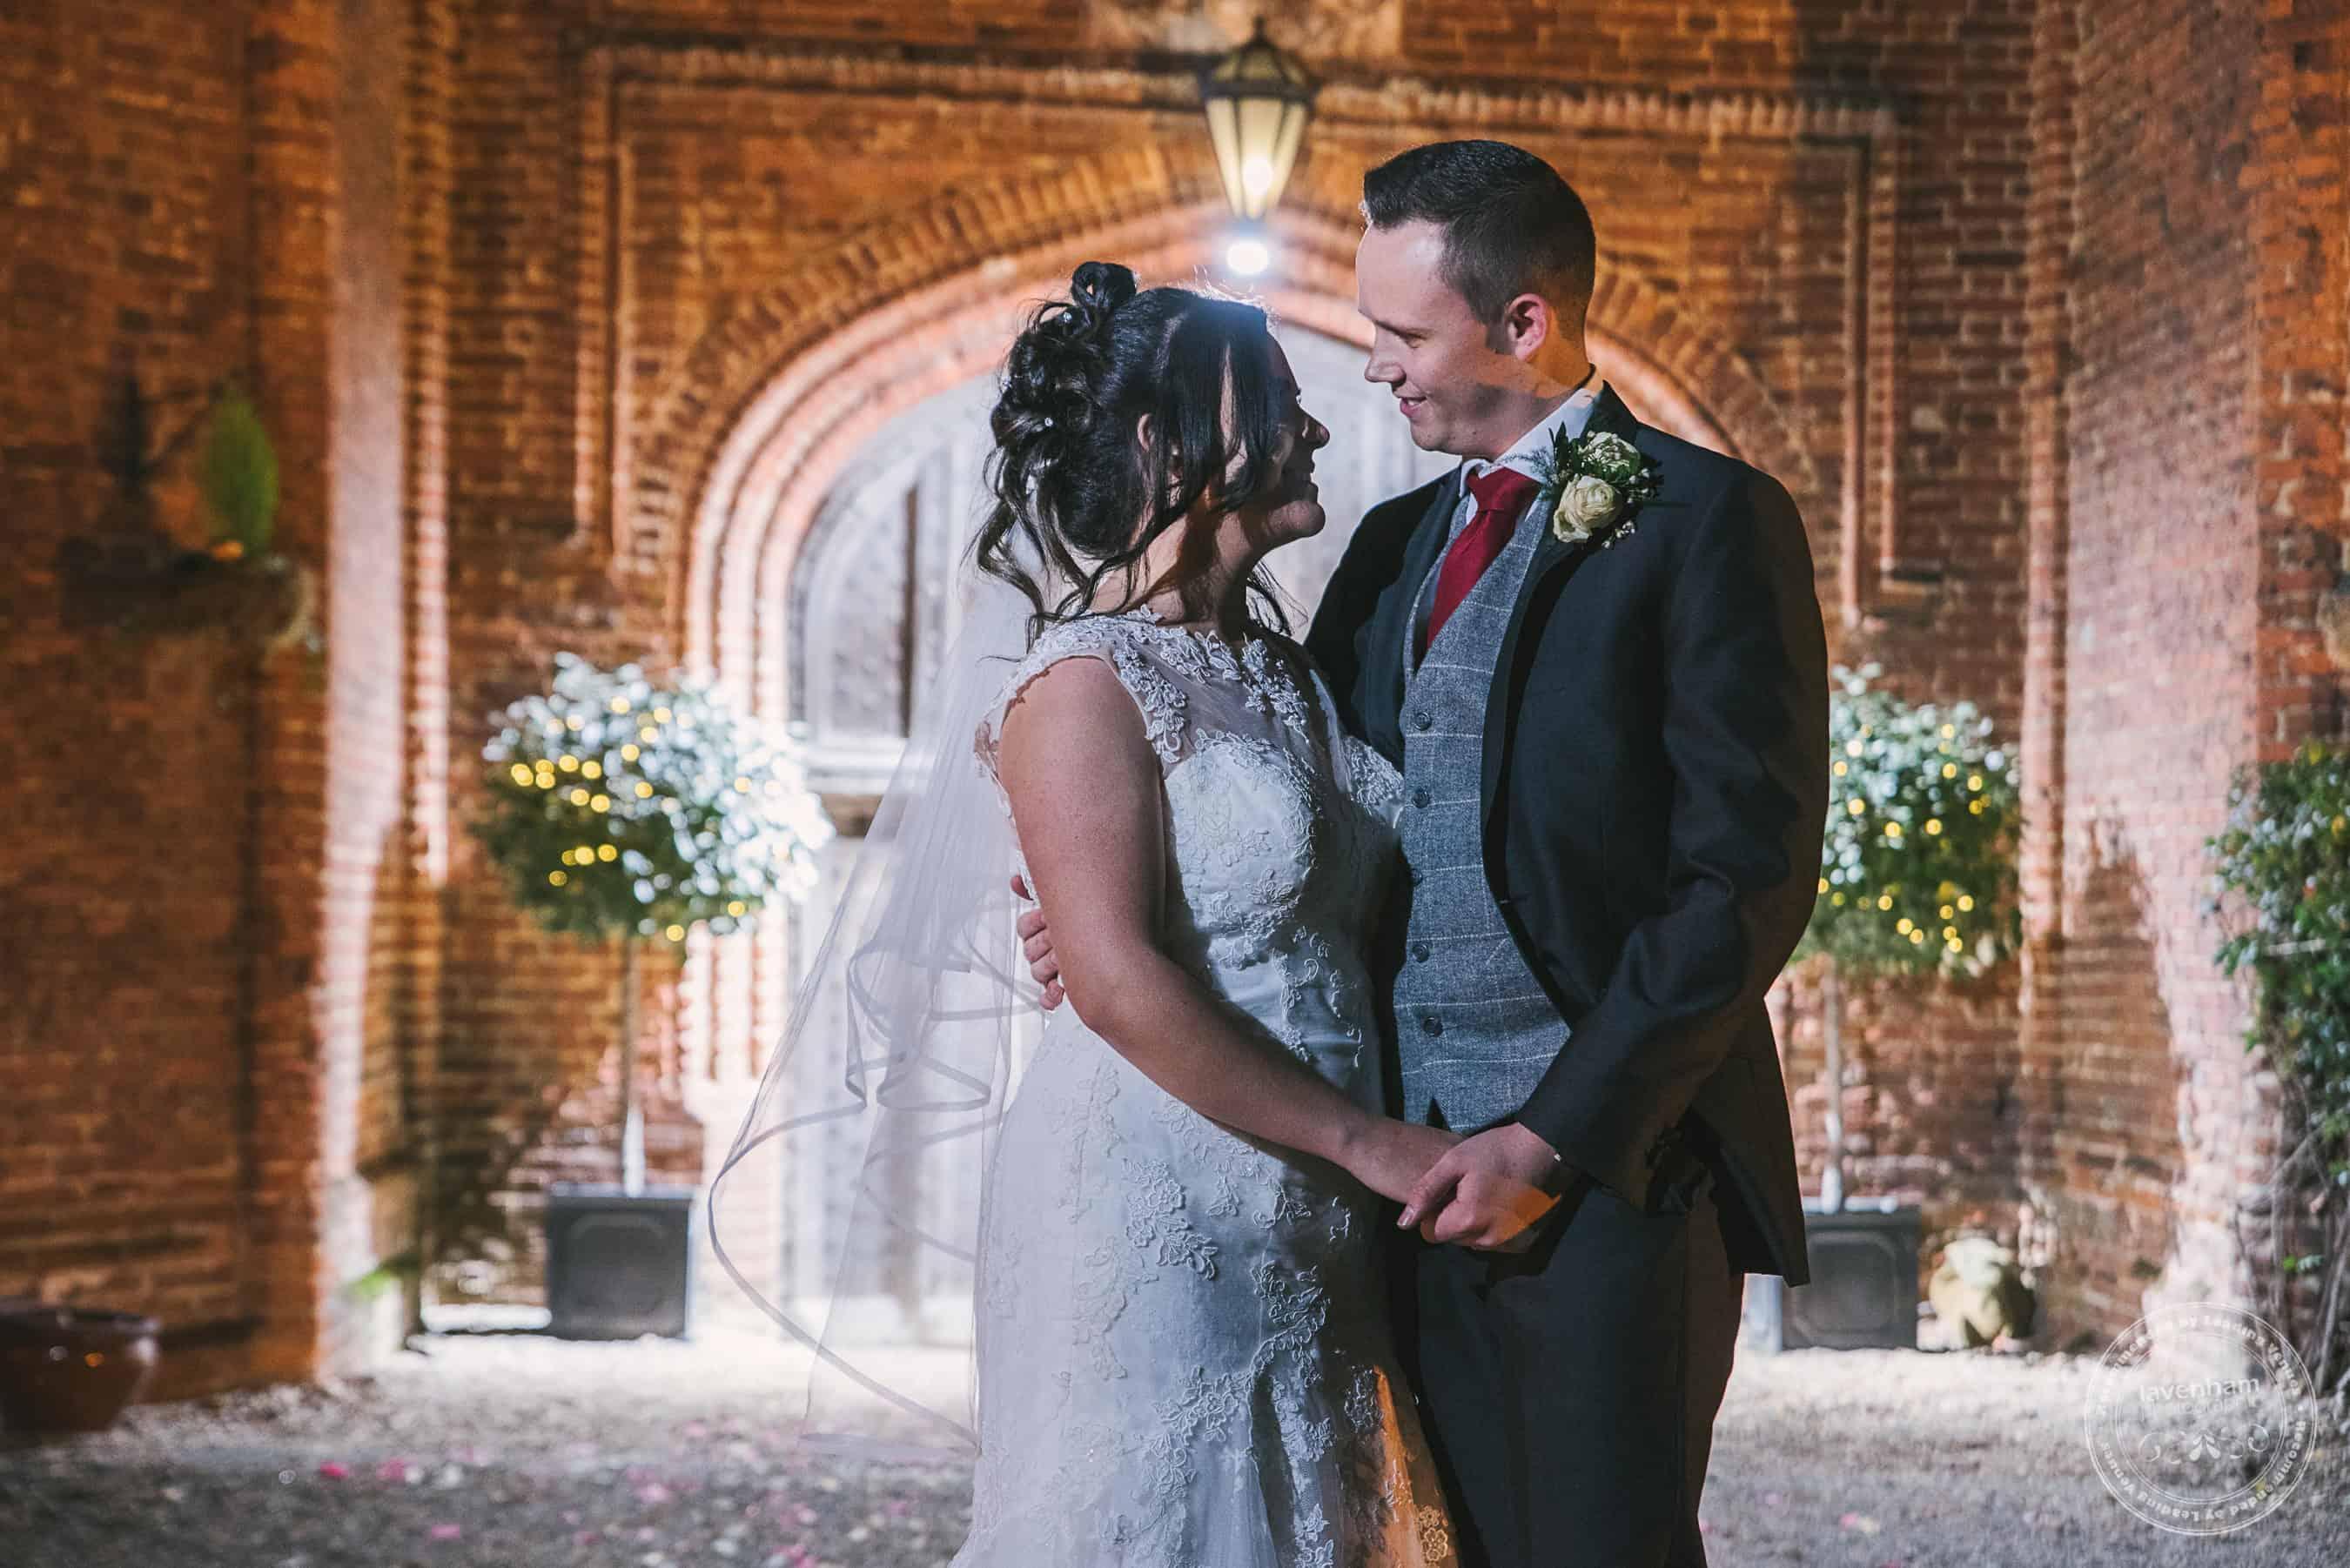 251118 Leez Priory Wedding Photography by Lavenham Photographic 114